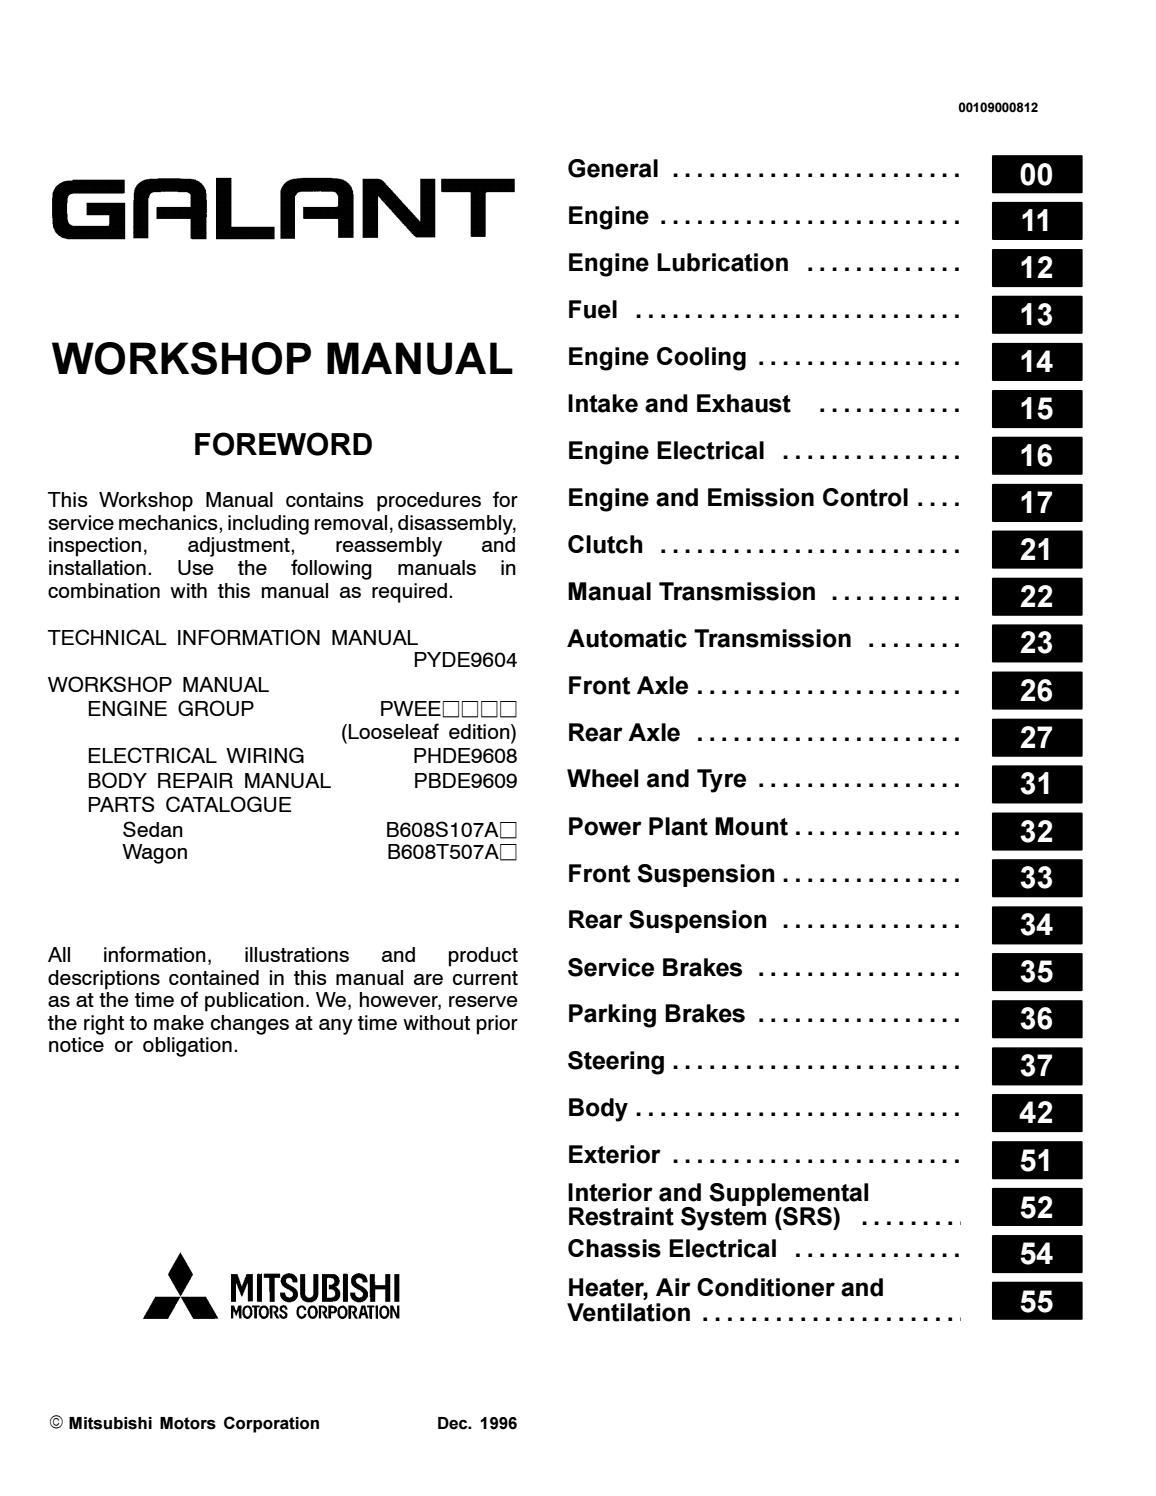 2000 mitsubishi galant service repair manual by 1634437 - issuu  issuu